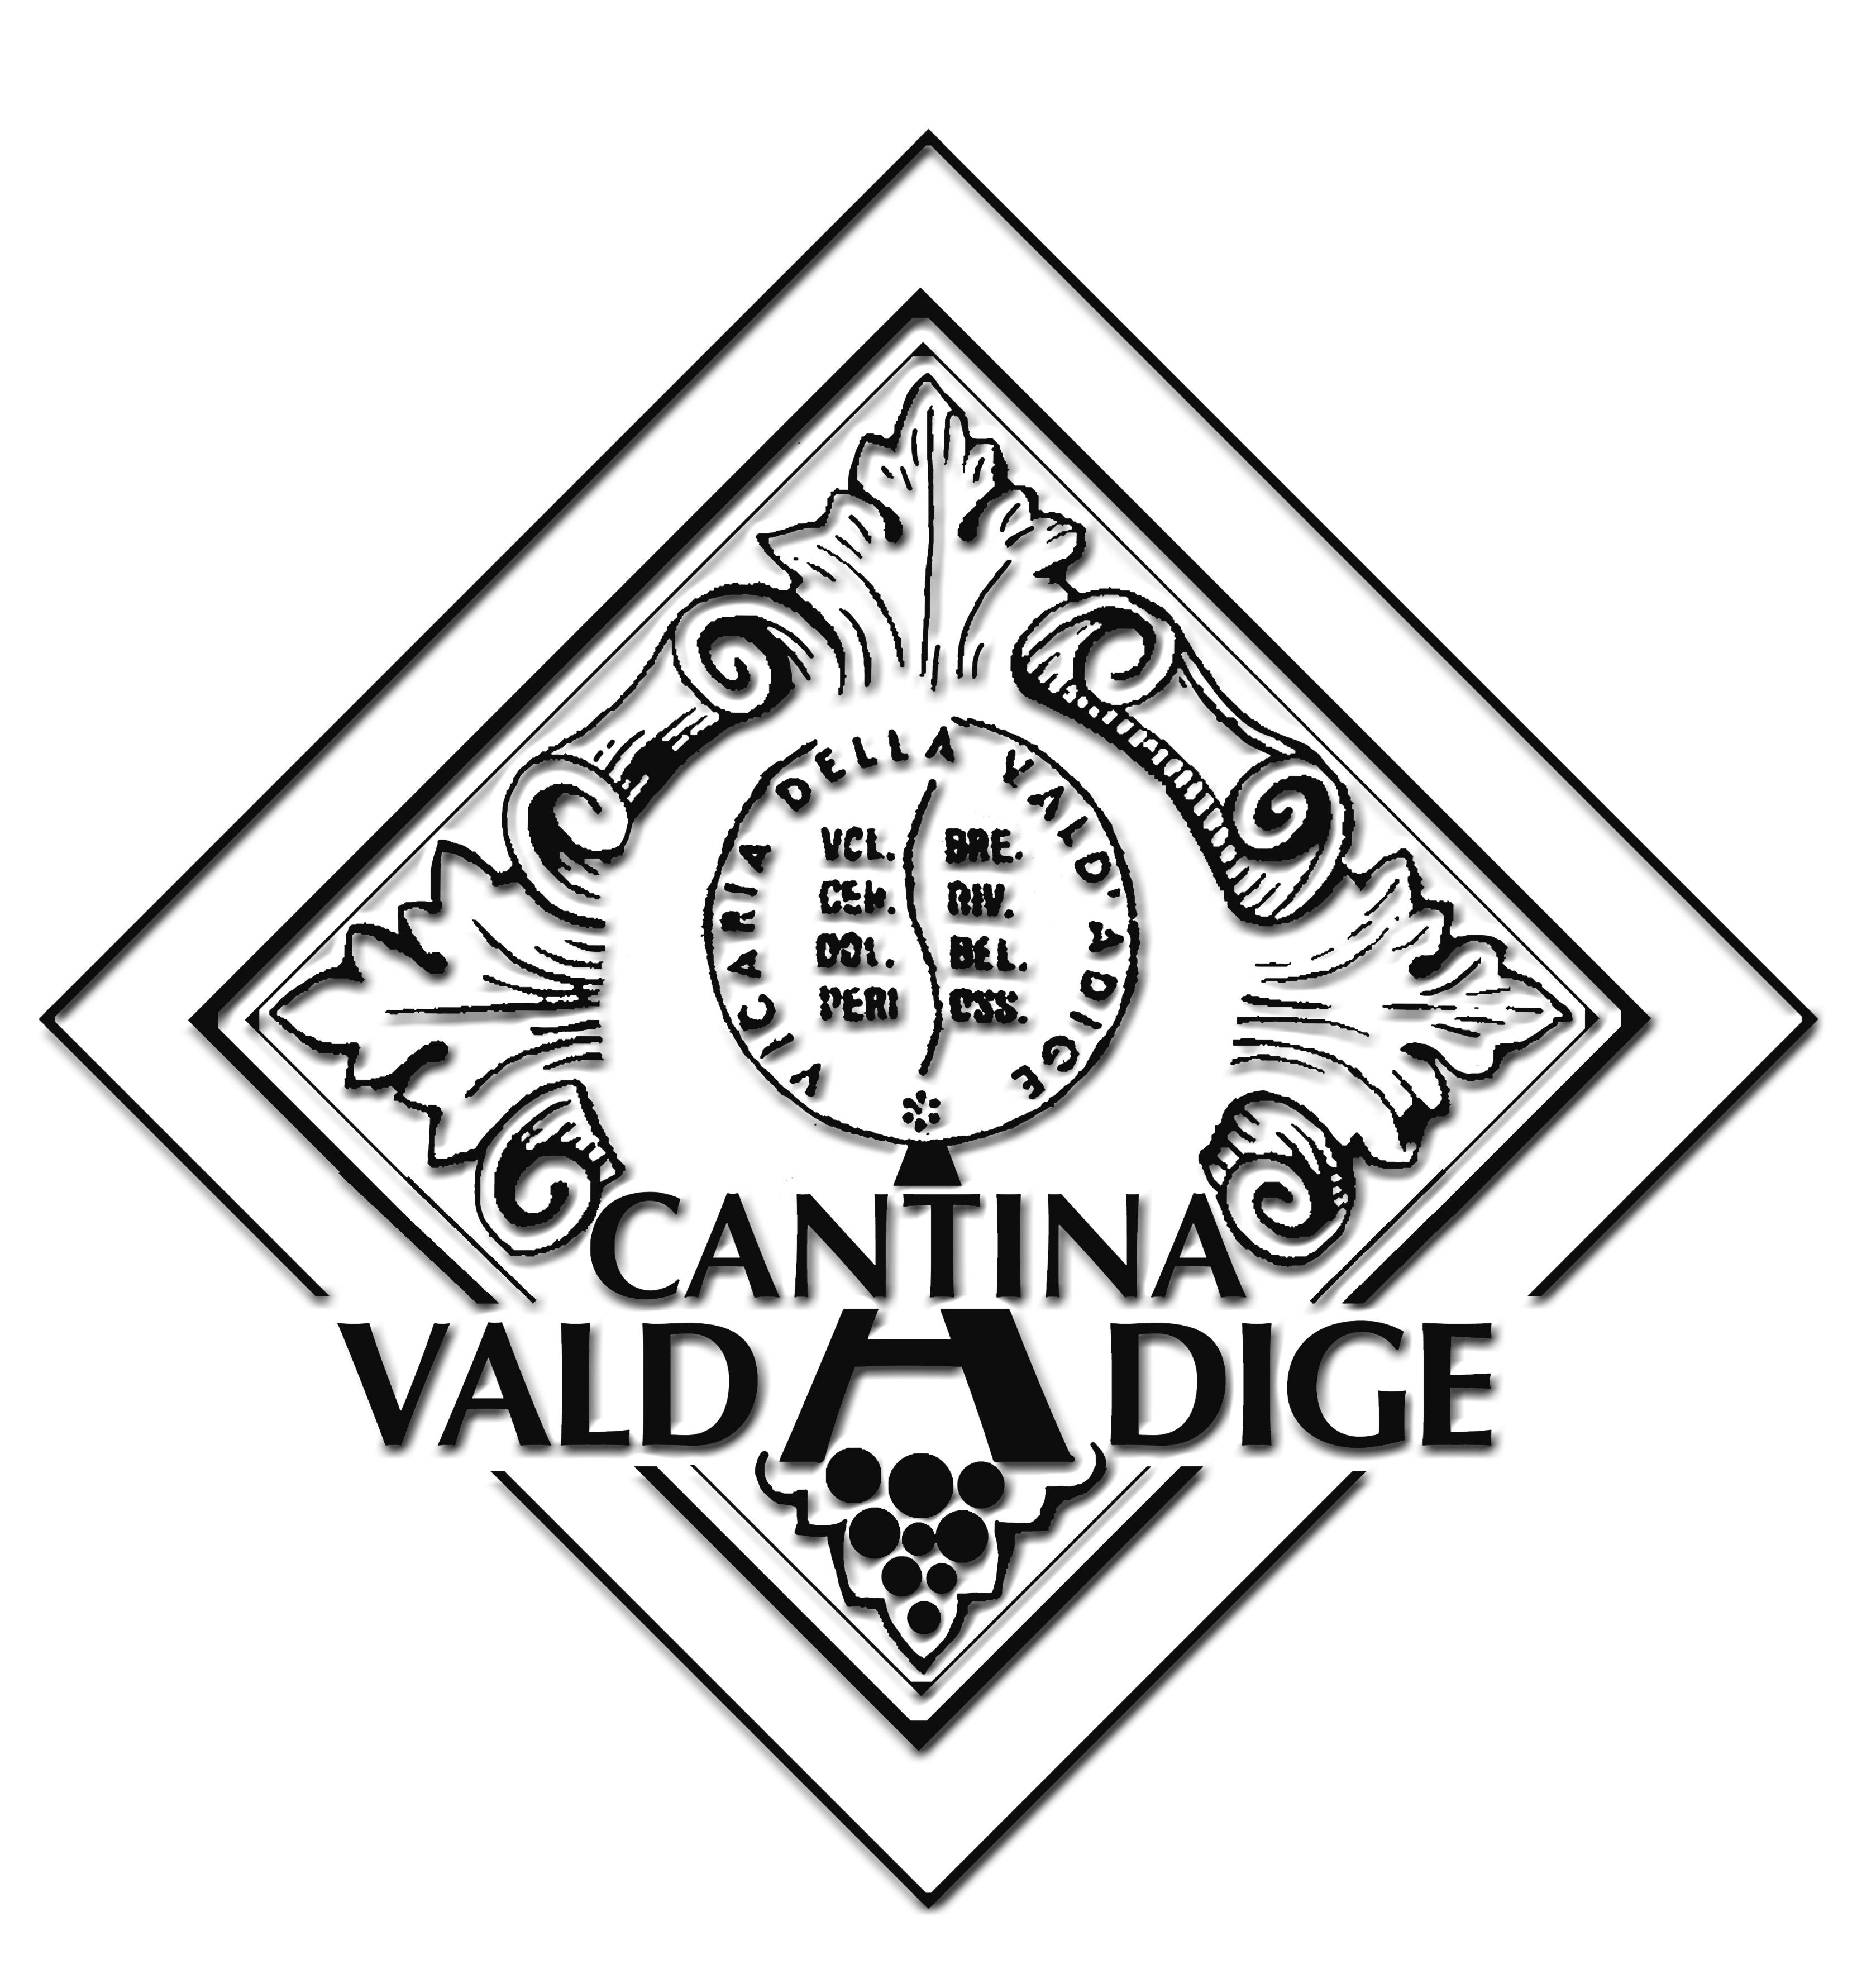 Cantina Valdadige Veronese